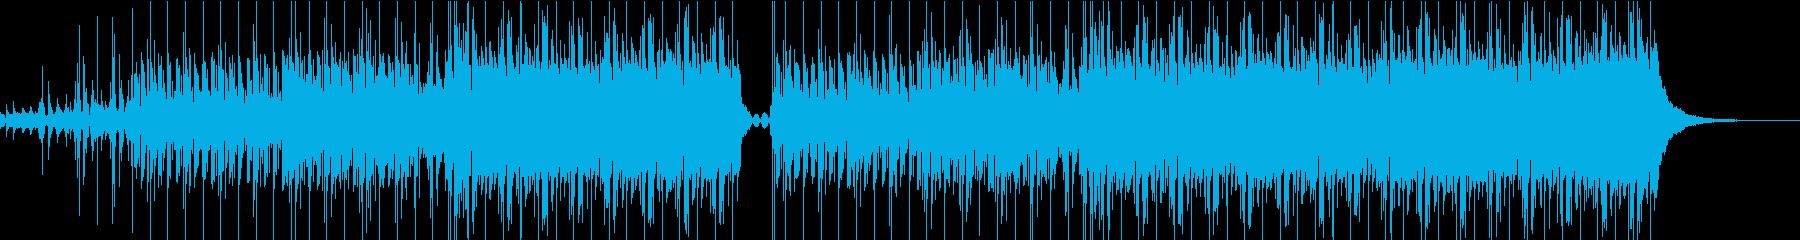 Pop Musicの再生済みの波形